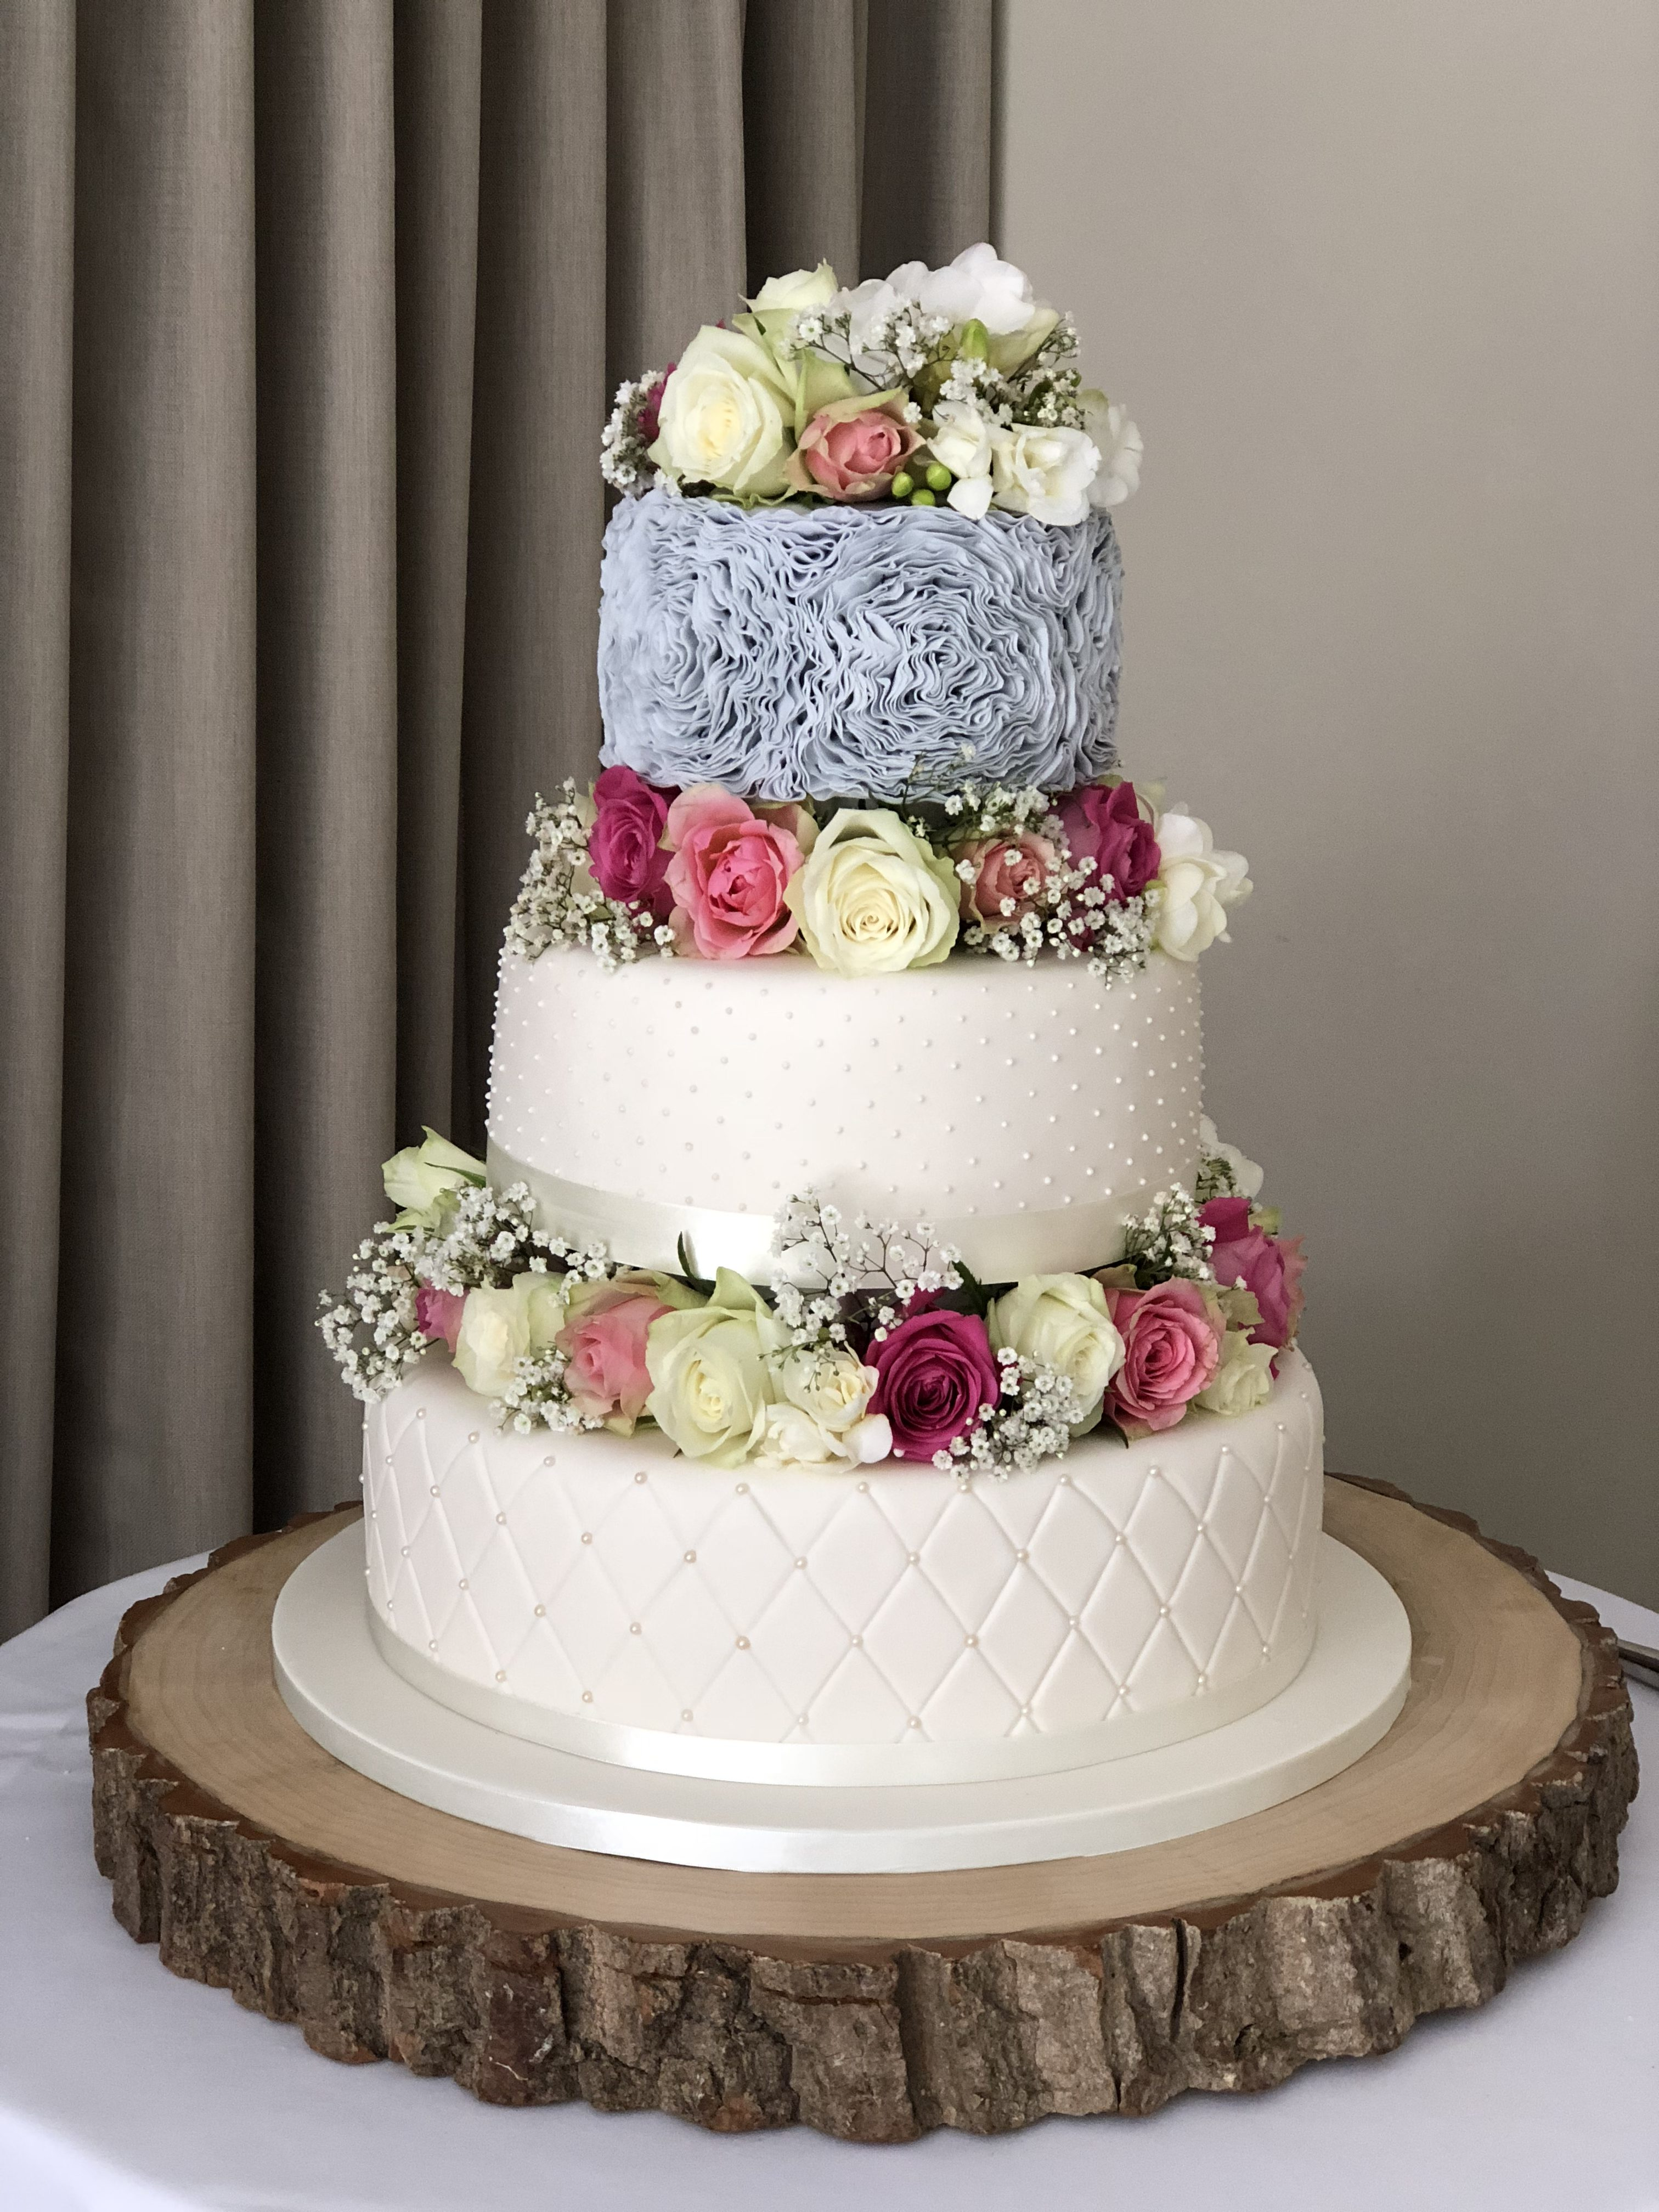 Romance w: Ruffles Wedding Cake